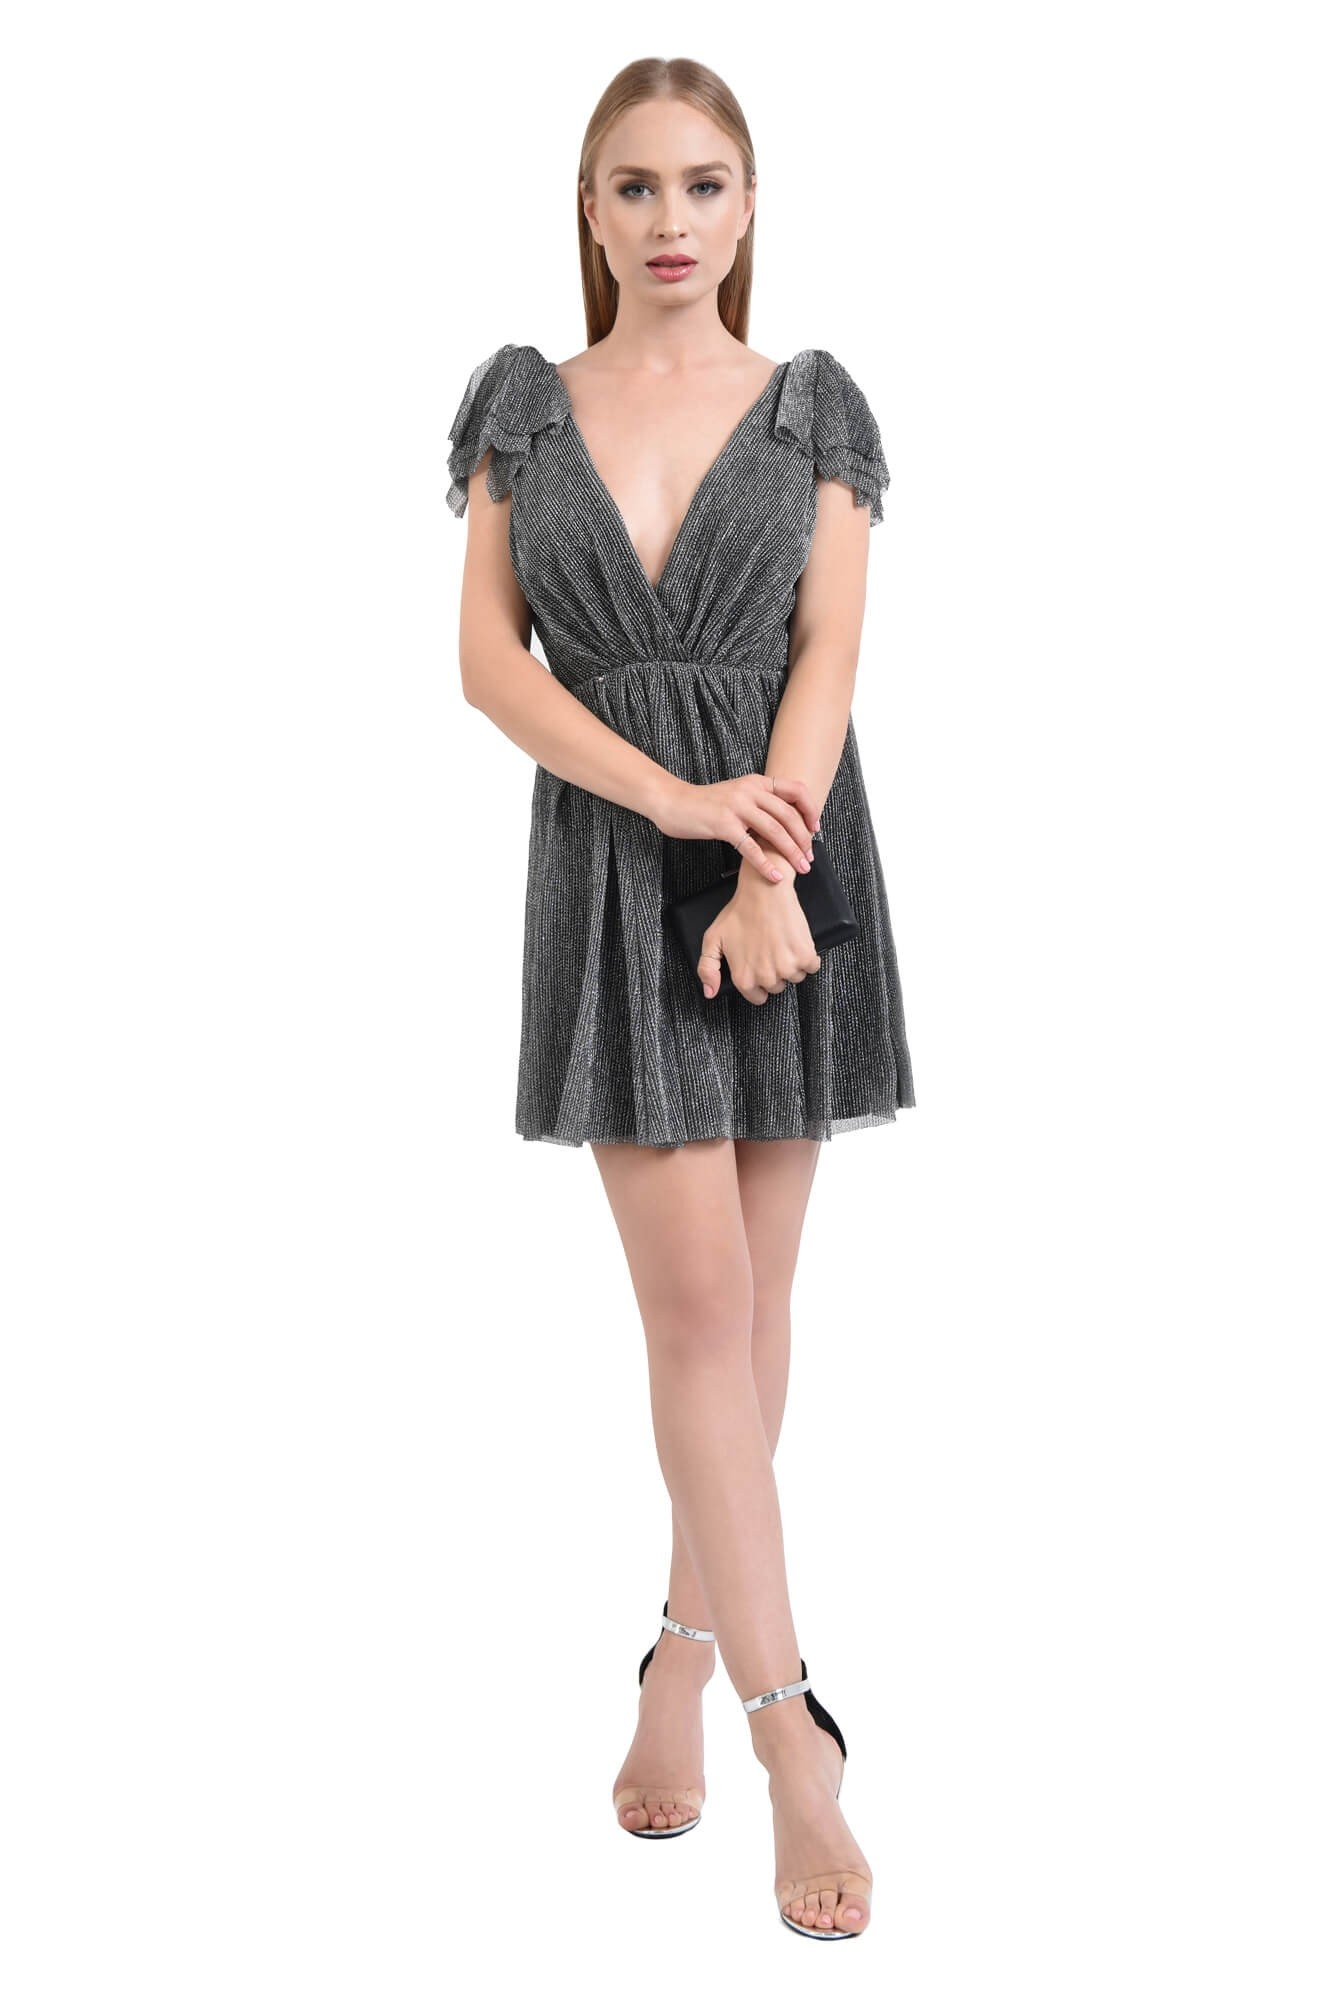 0 - rochie de ocazie, argintiu, negru, lurex, funde